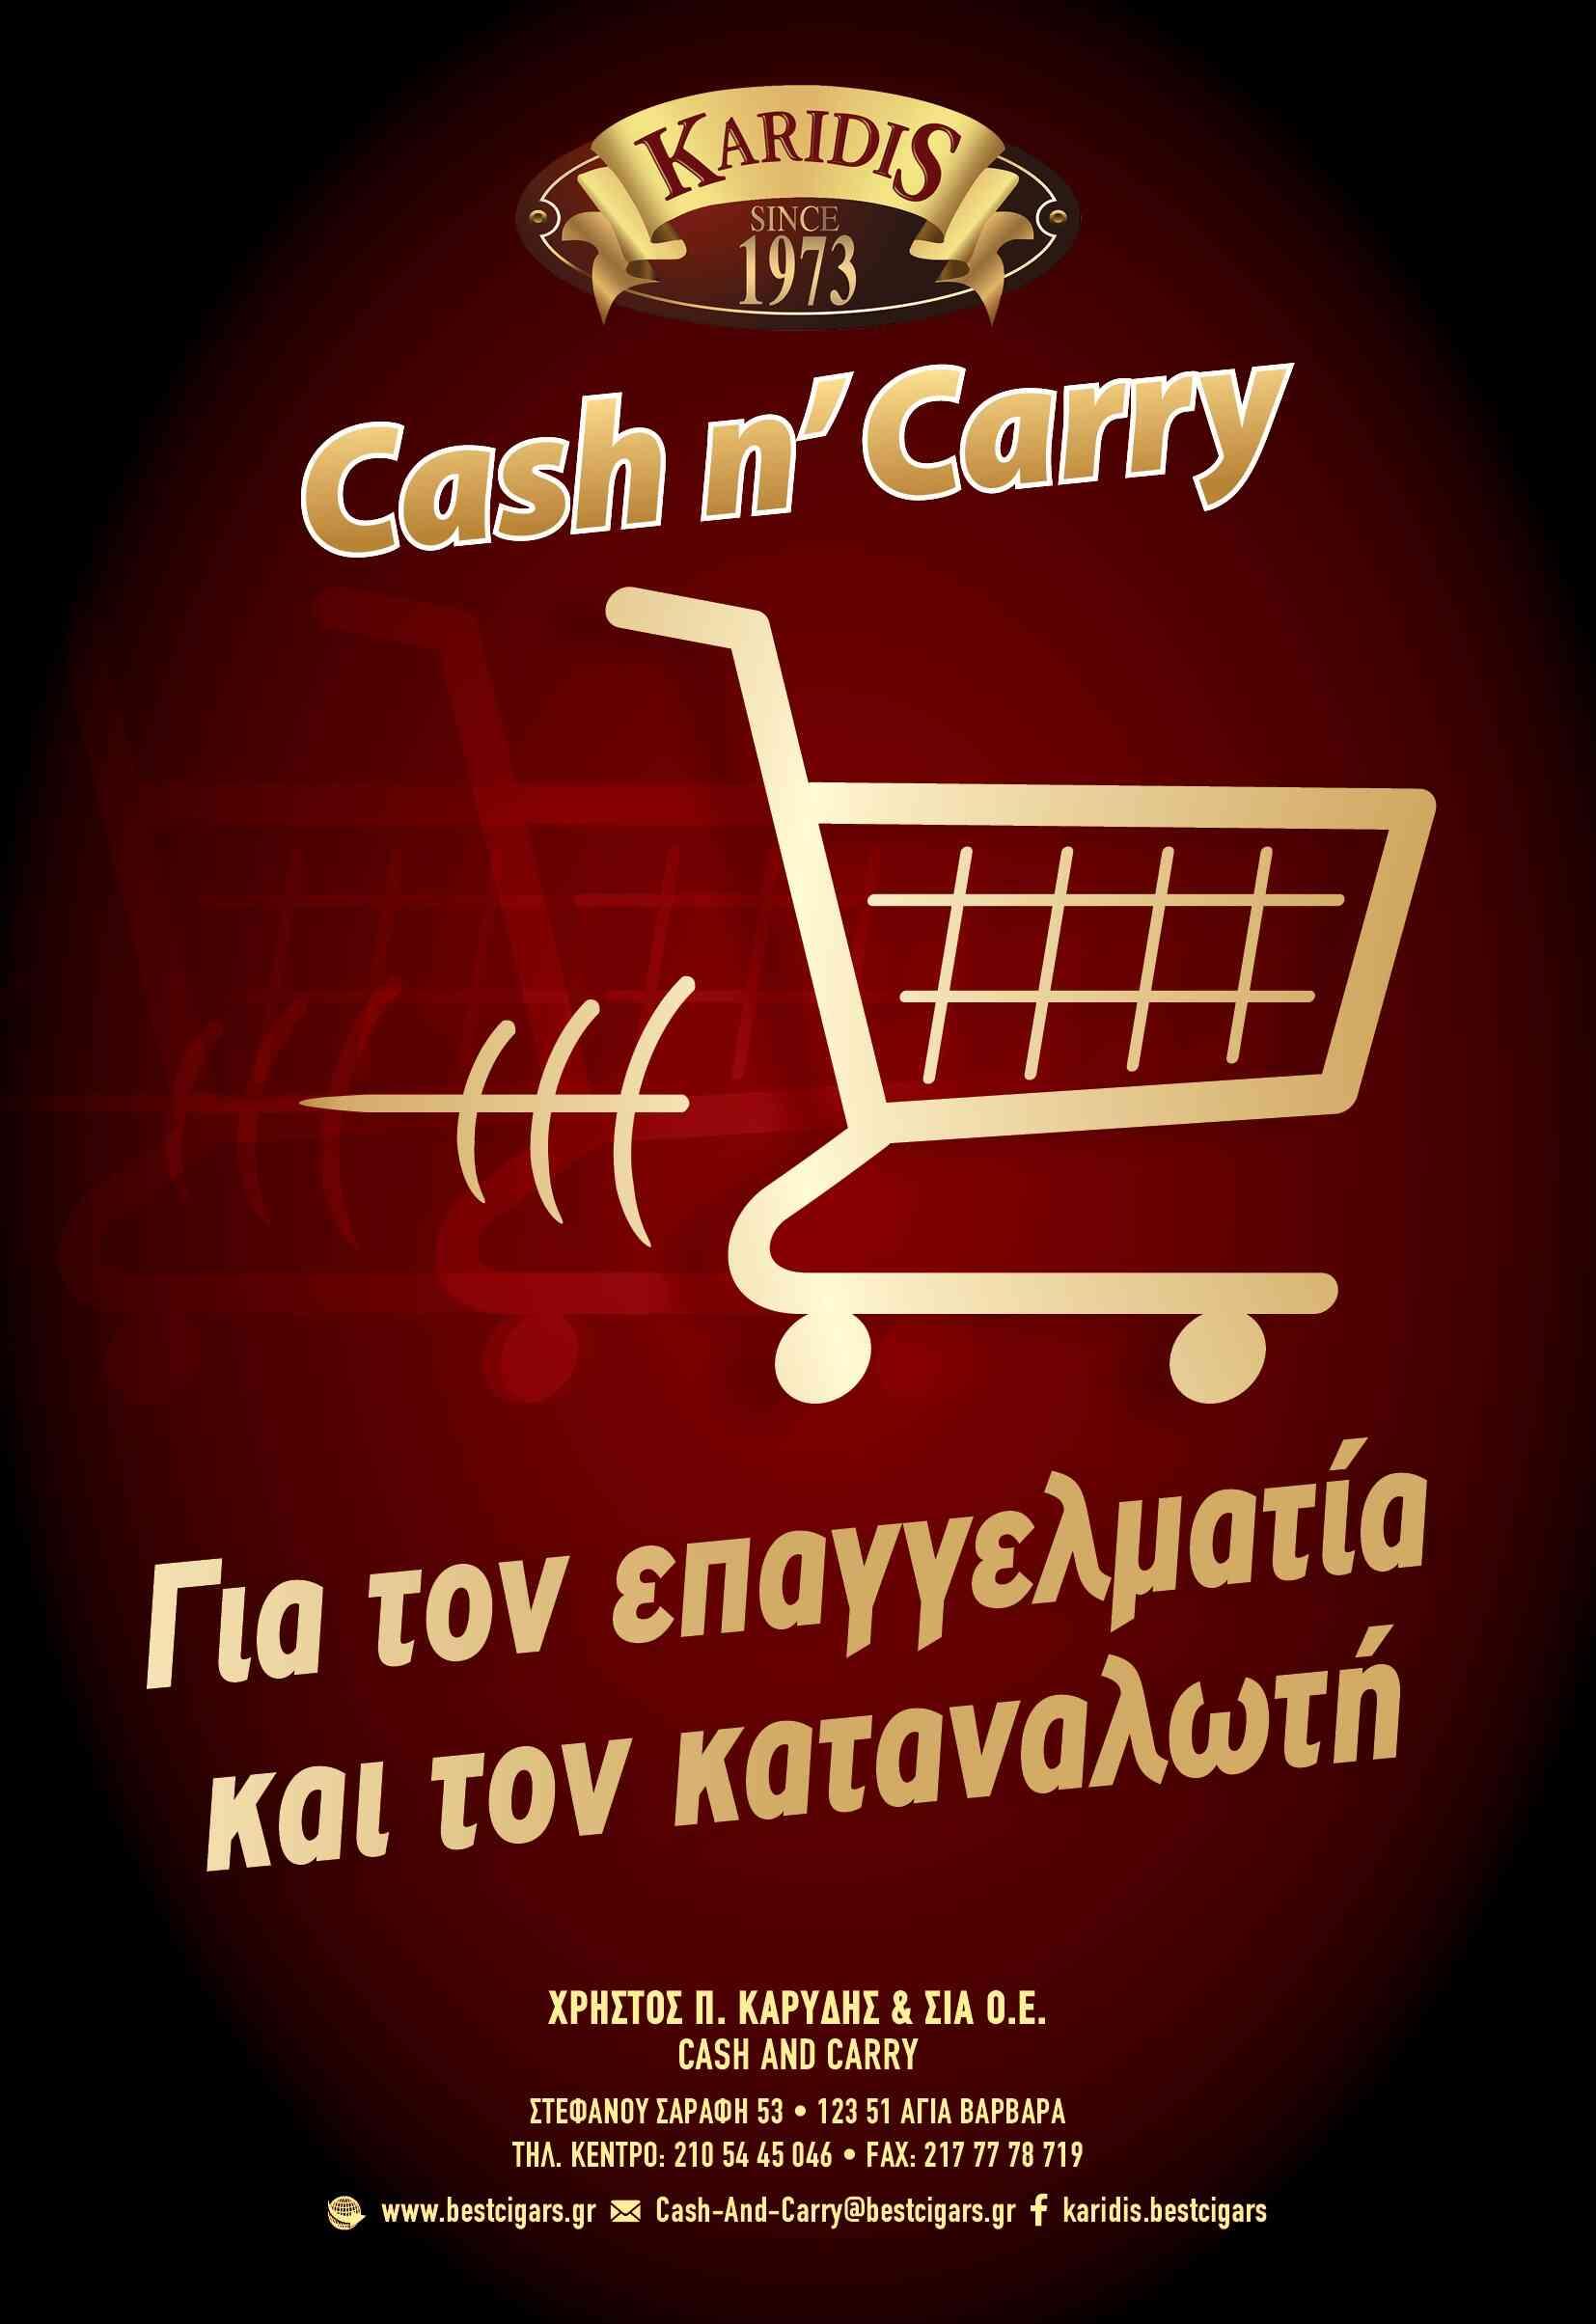 3704erg-karidis-hmerologio-2020-8sel3_cash